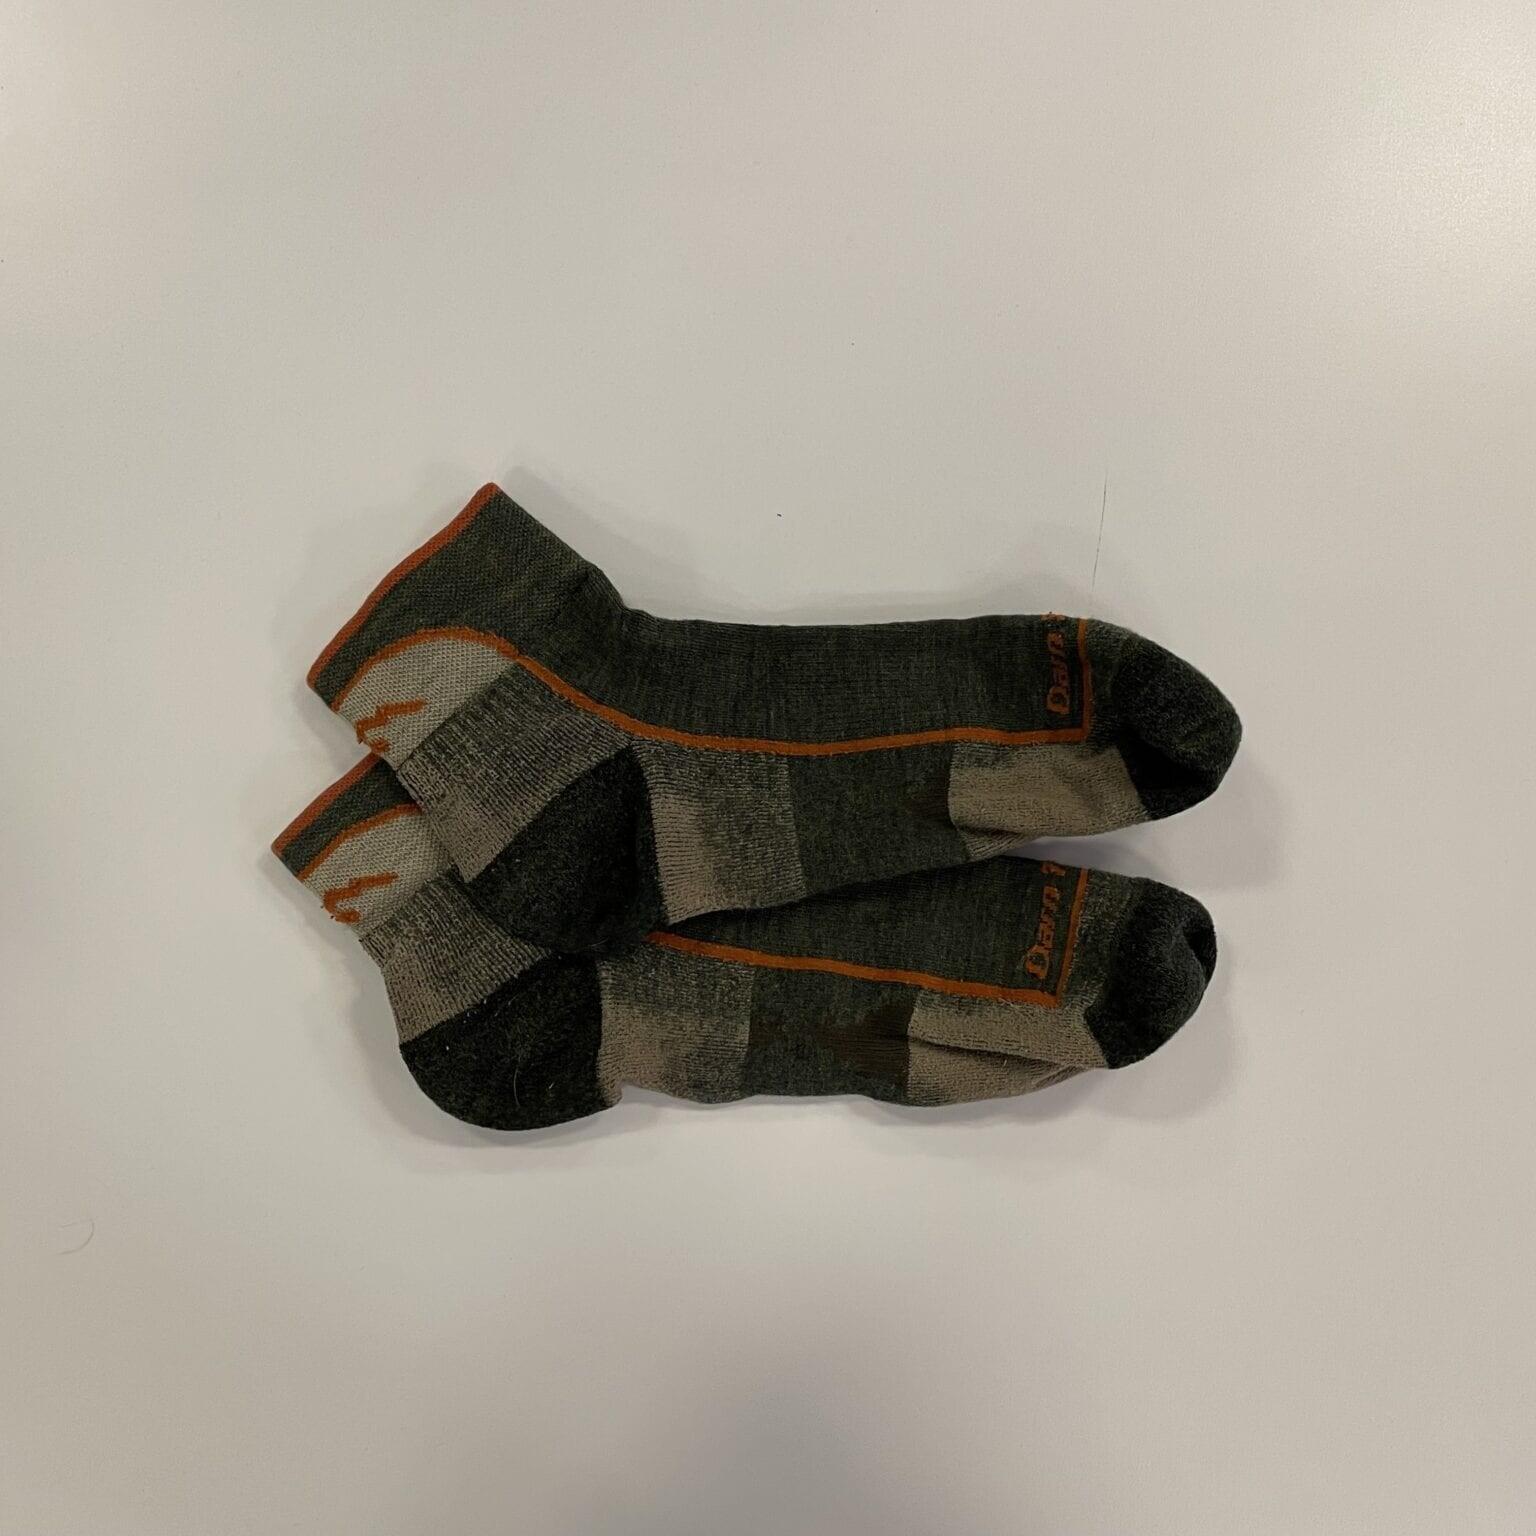 a pair of hiking socks